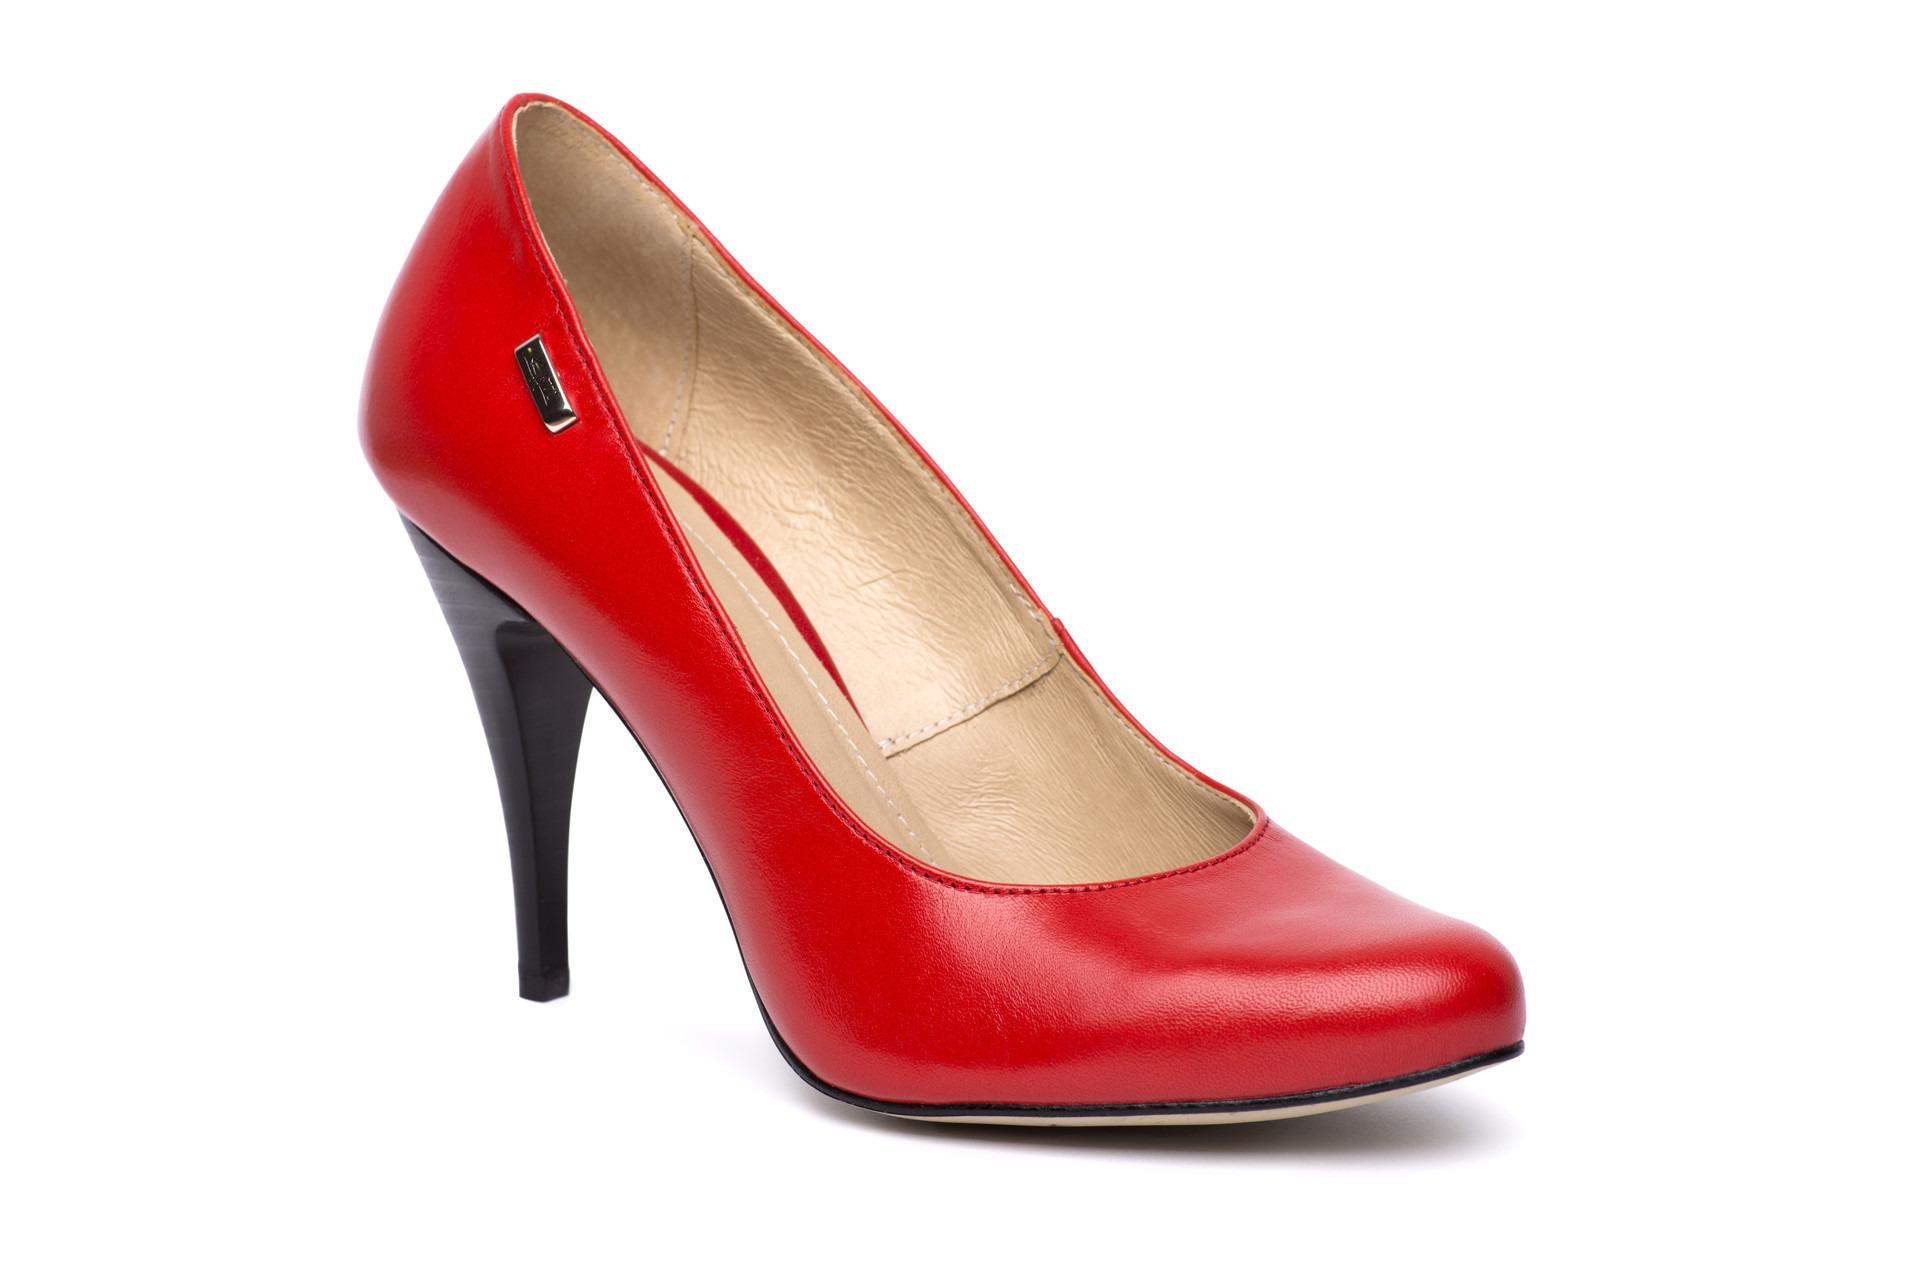 a53f50943f GALLERY SHOES - Lodičky - Lodičky červené matné KATI